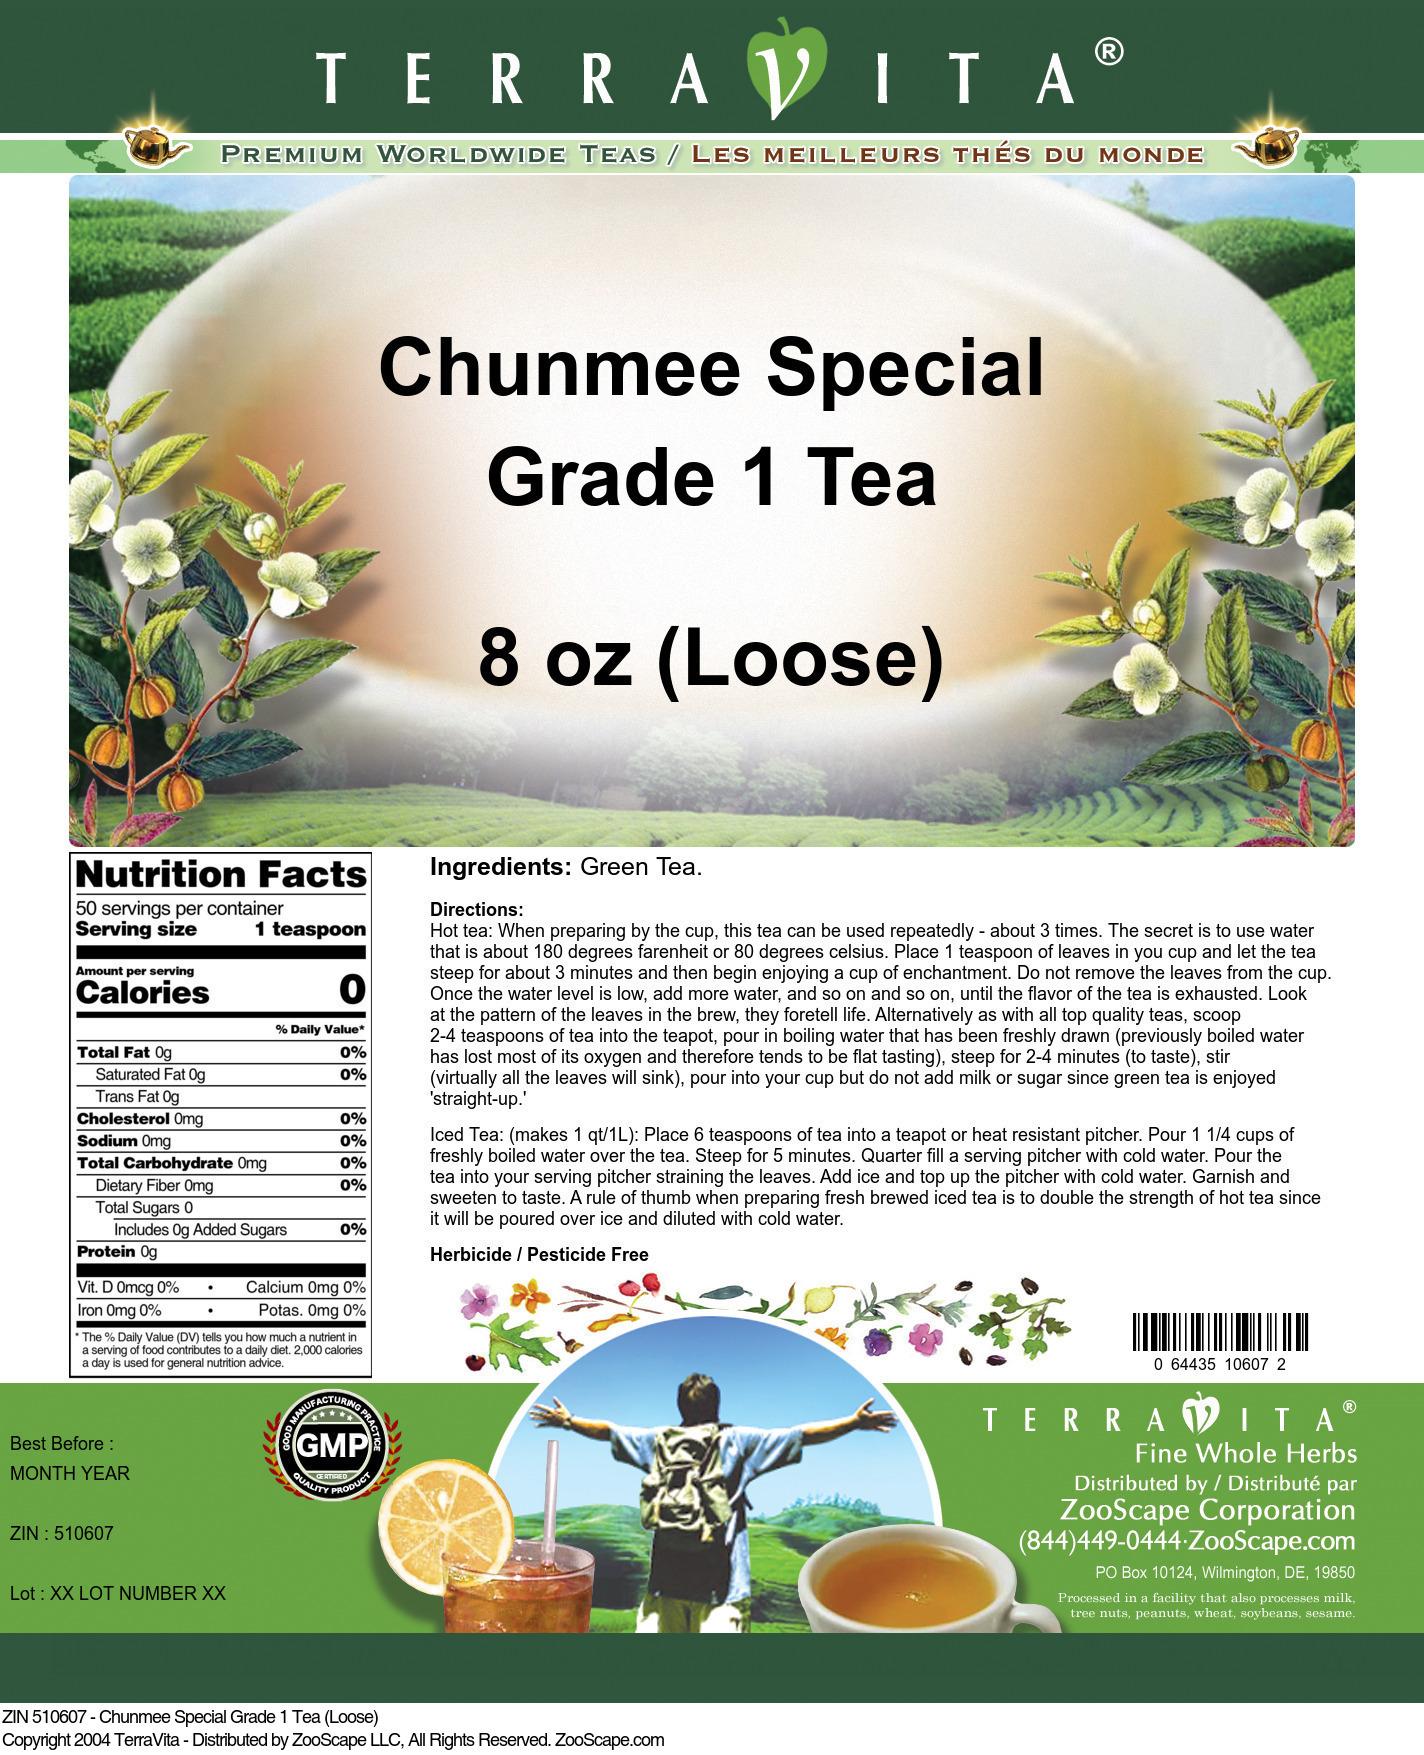 Chunmee Special Grade 1